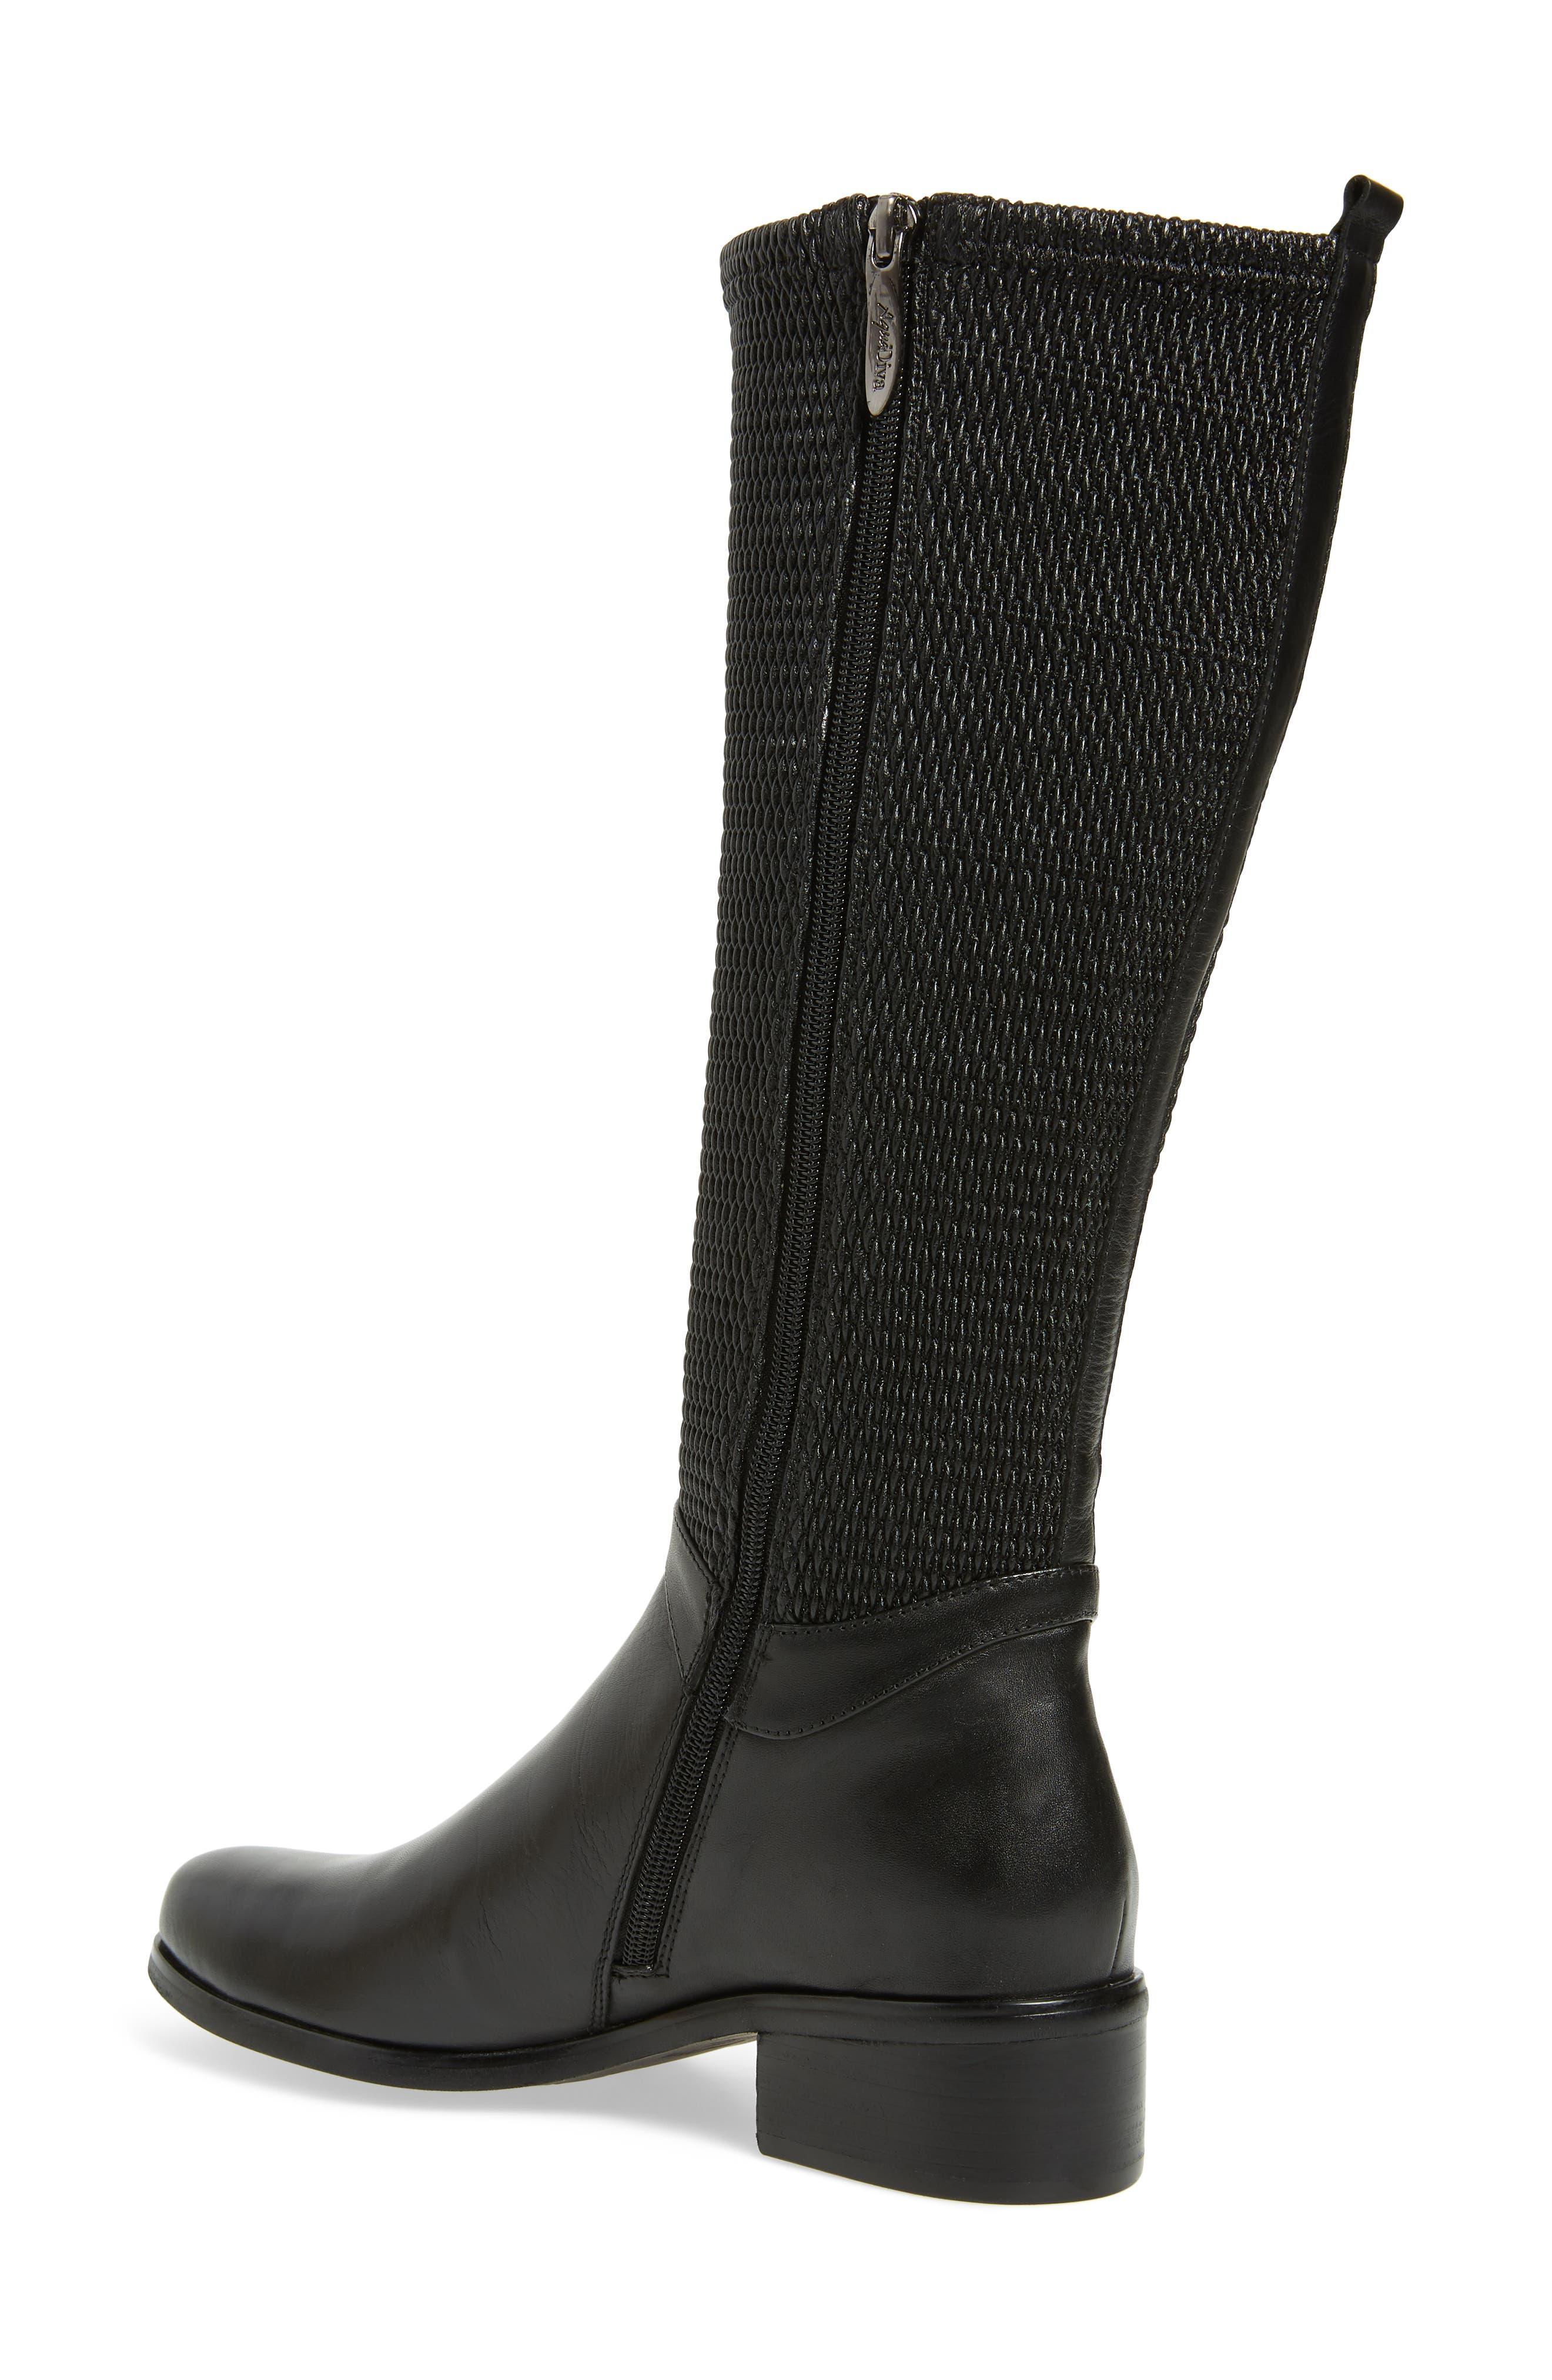 AQUADIVA,                             Kallena Waterproof Knee High Boot,                             Alternate thumbnail 2, color,                             BLACK LEATHER